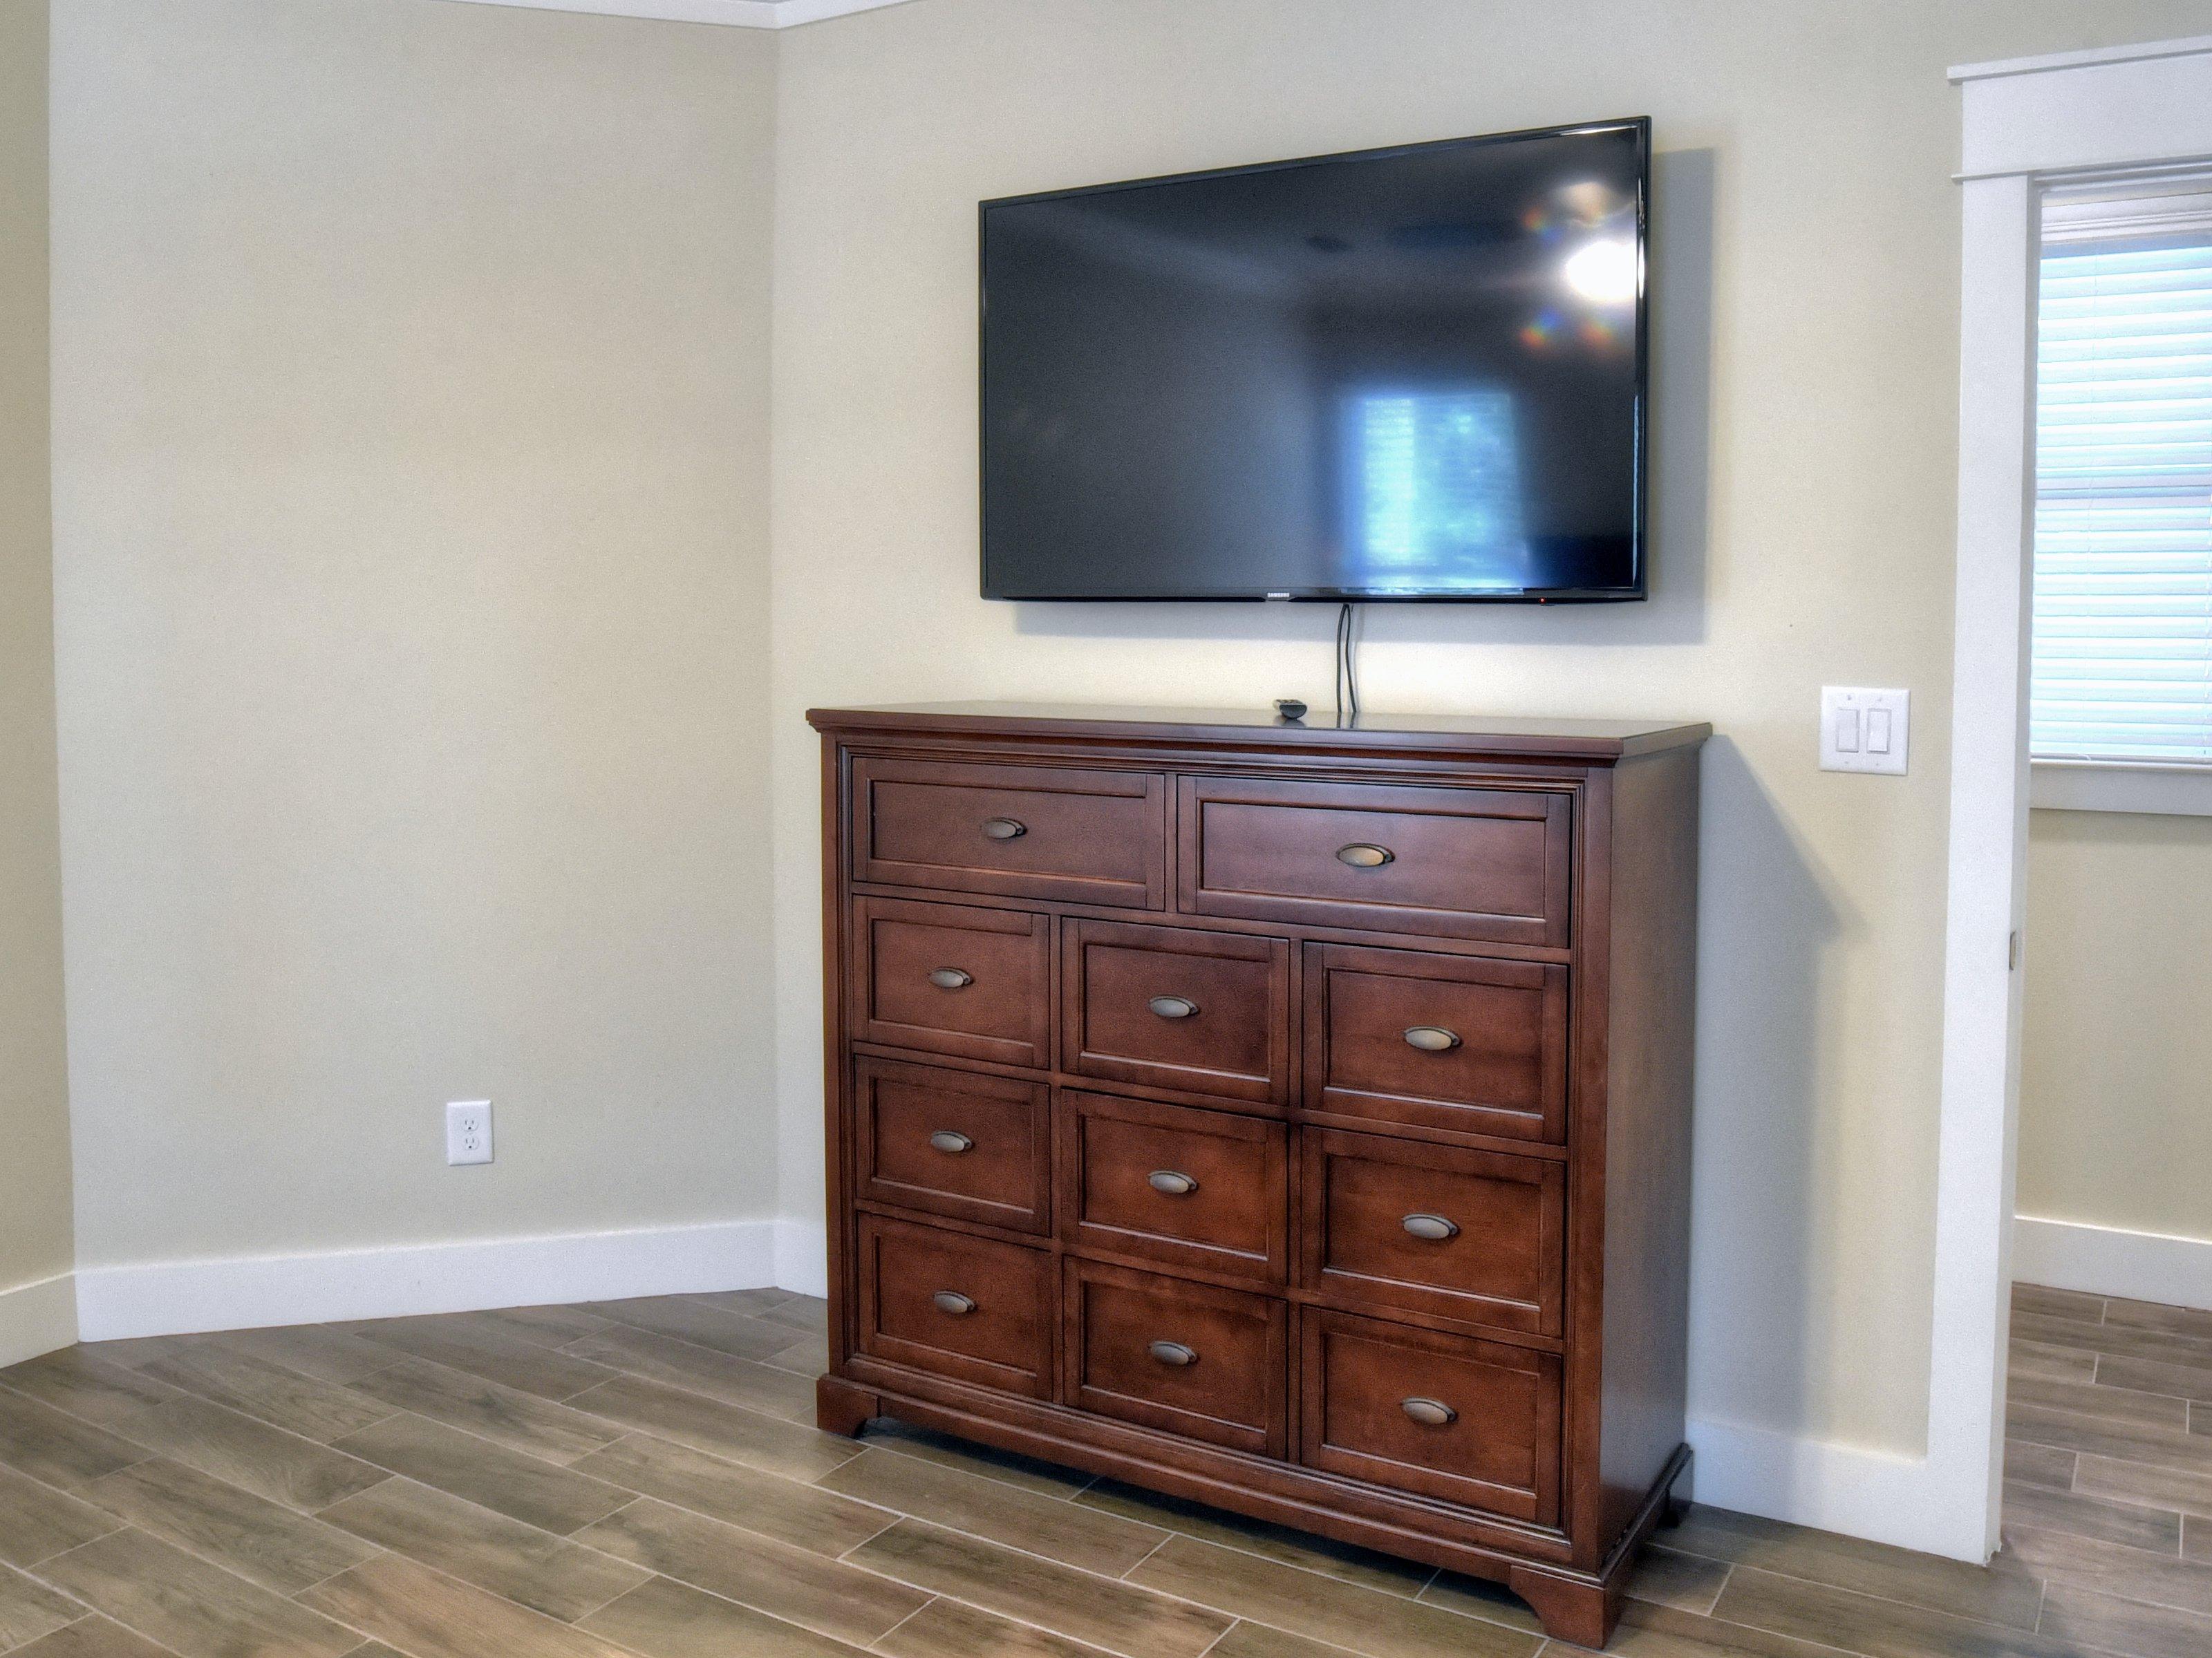 93 Beacon Point Condo rental in Sandestin Rentals ~ Cottages and Villas  in Destin Florida - #14